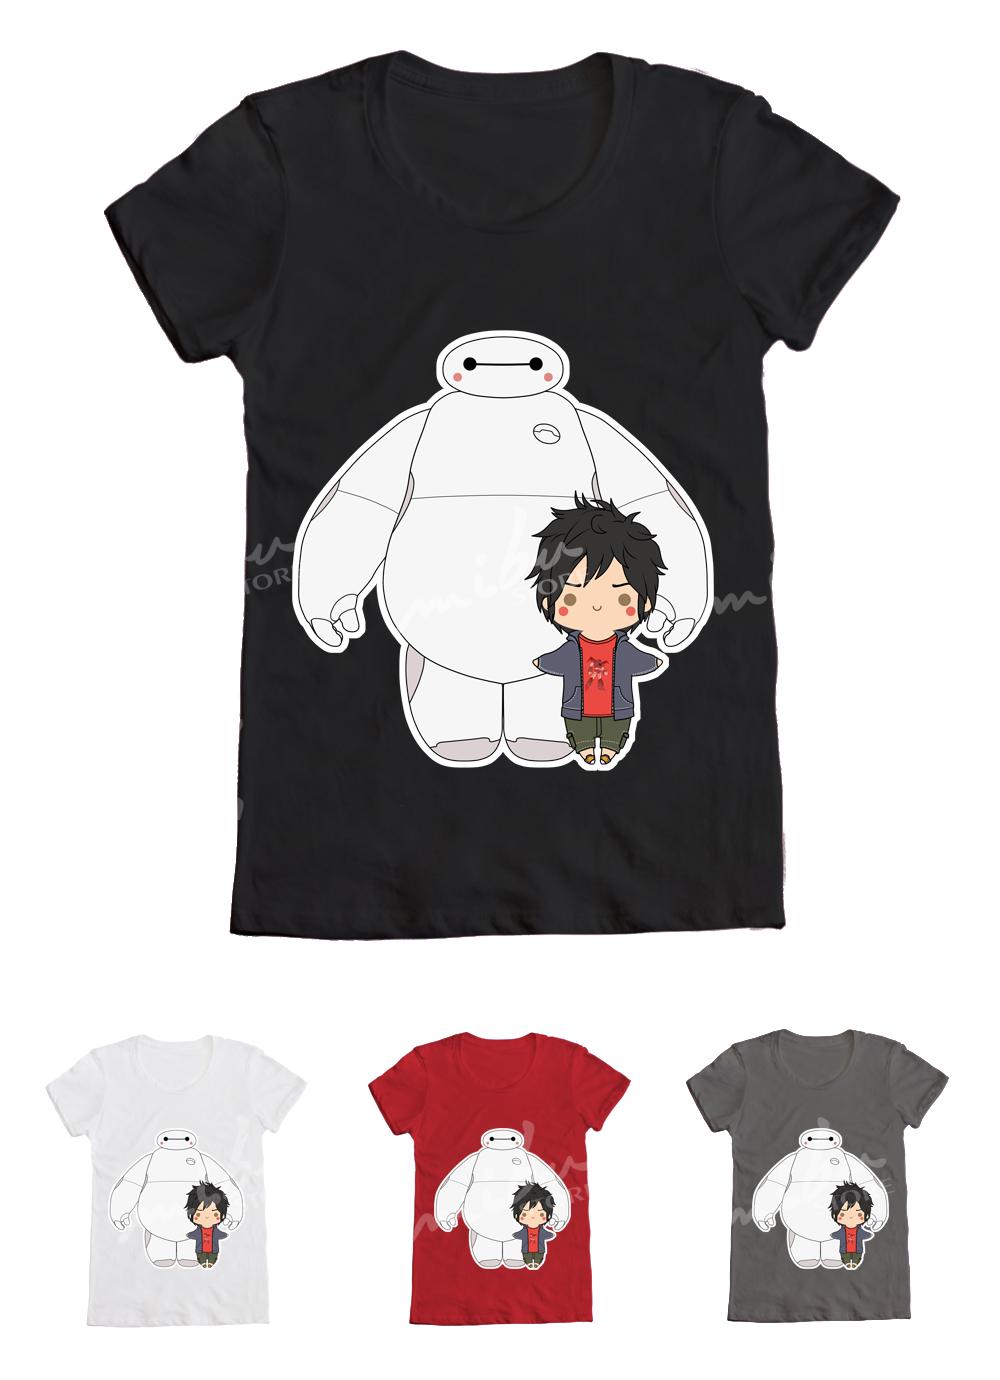 MibuStore · Custom T-Shirts | Big Hero 6 - Baymax+Hiro - T-Shirt